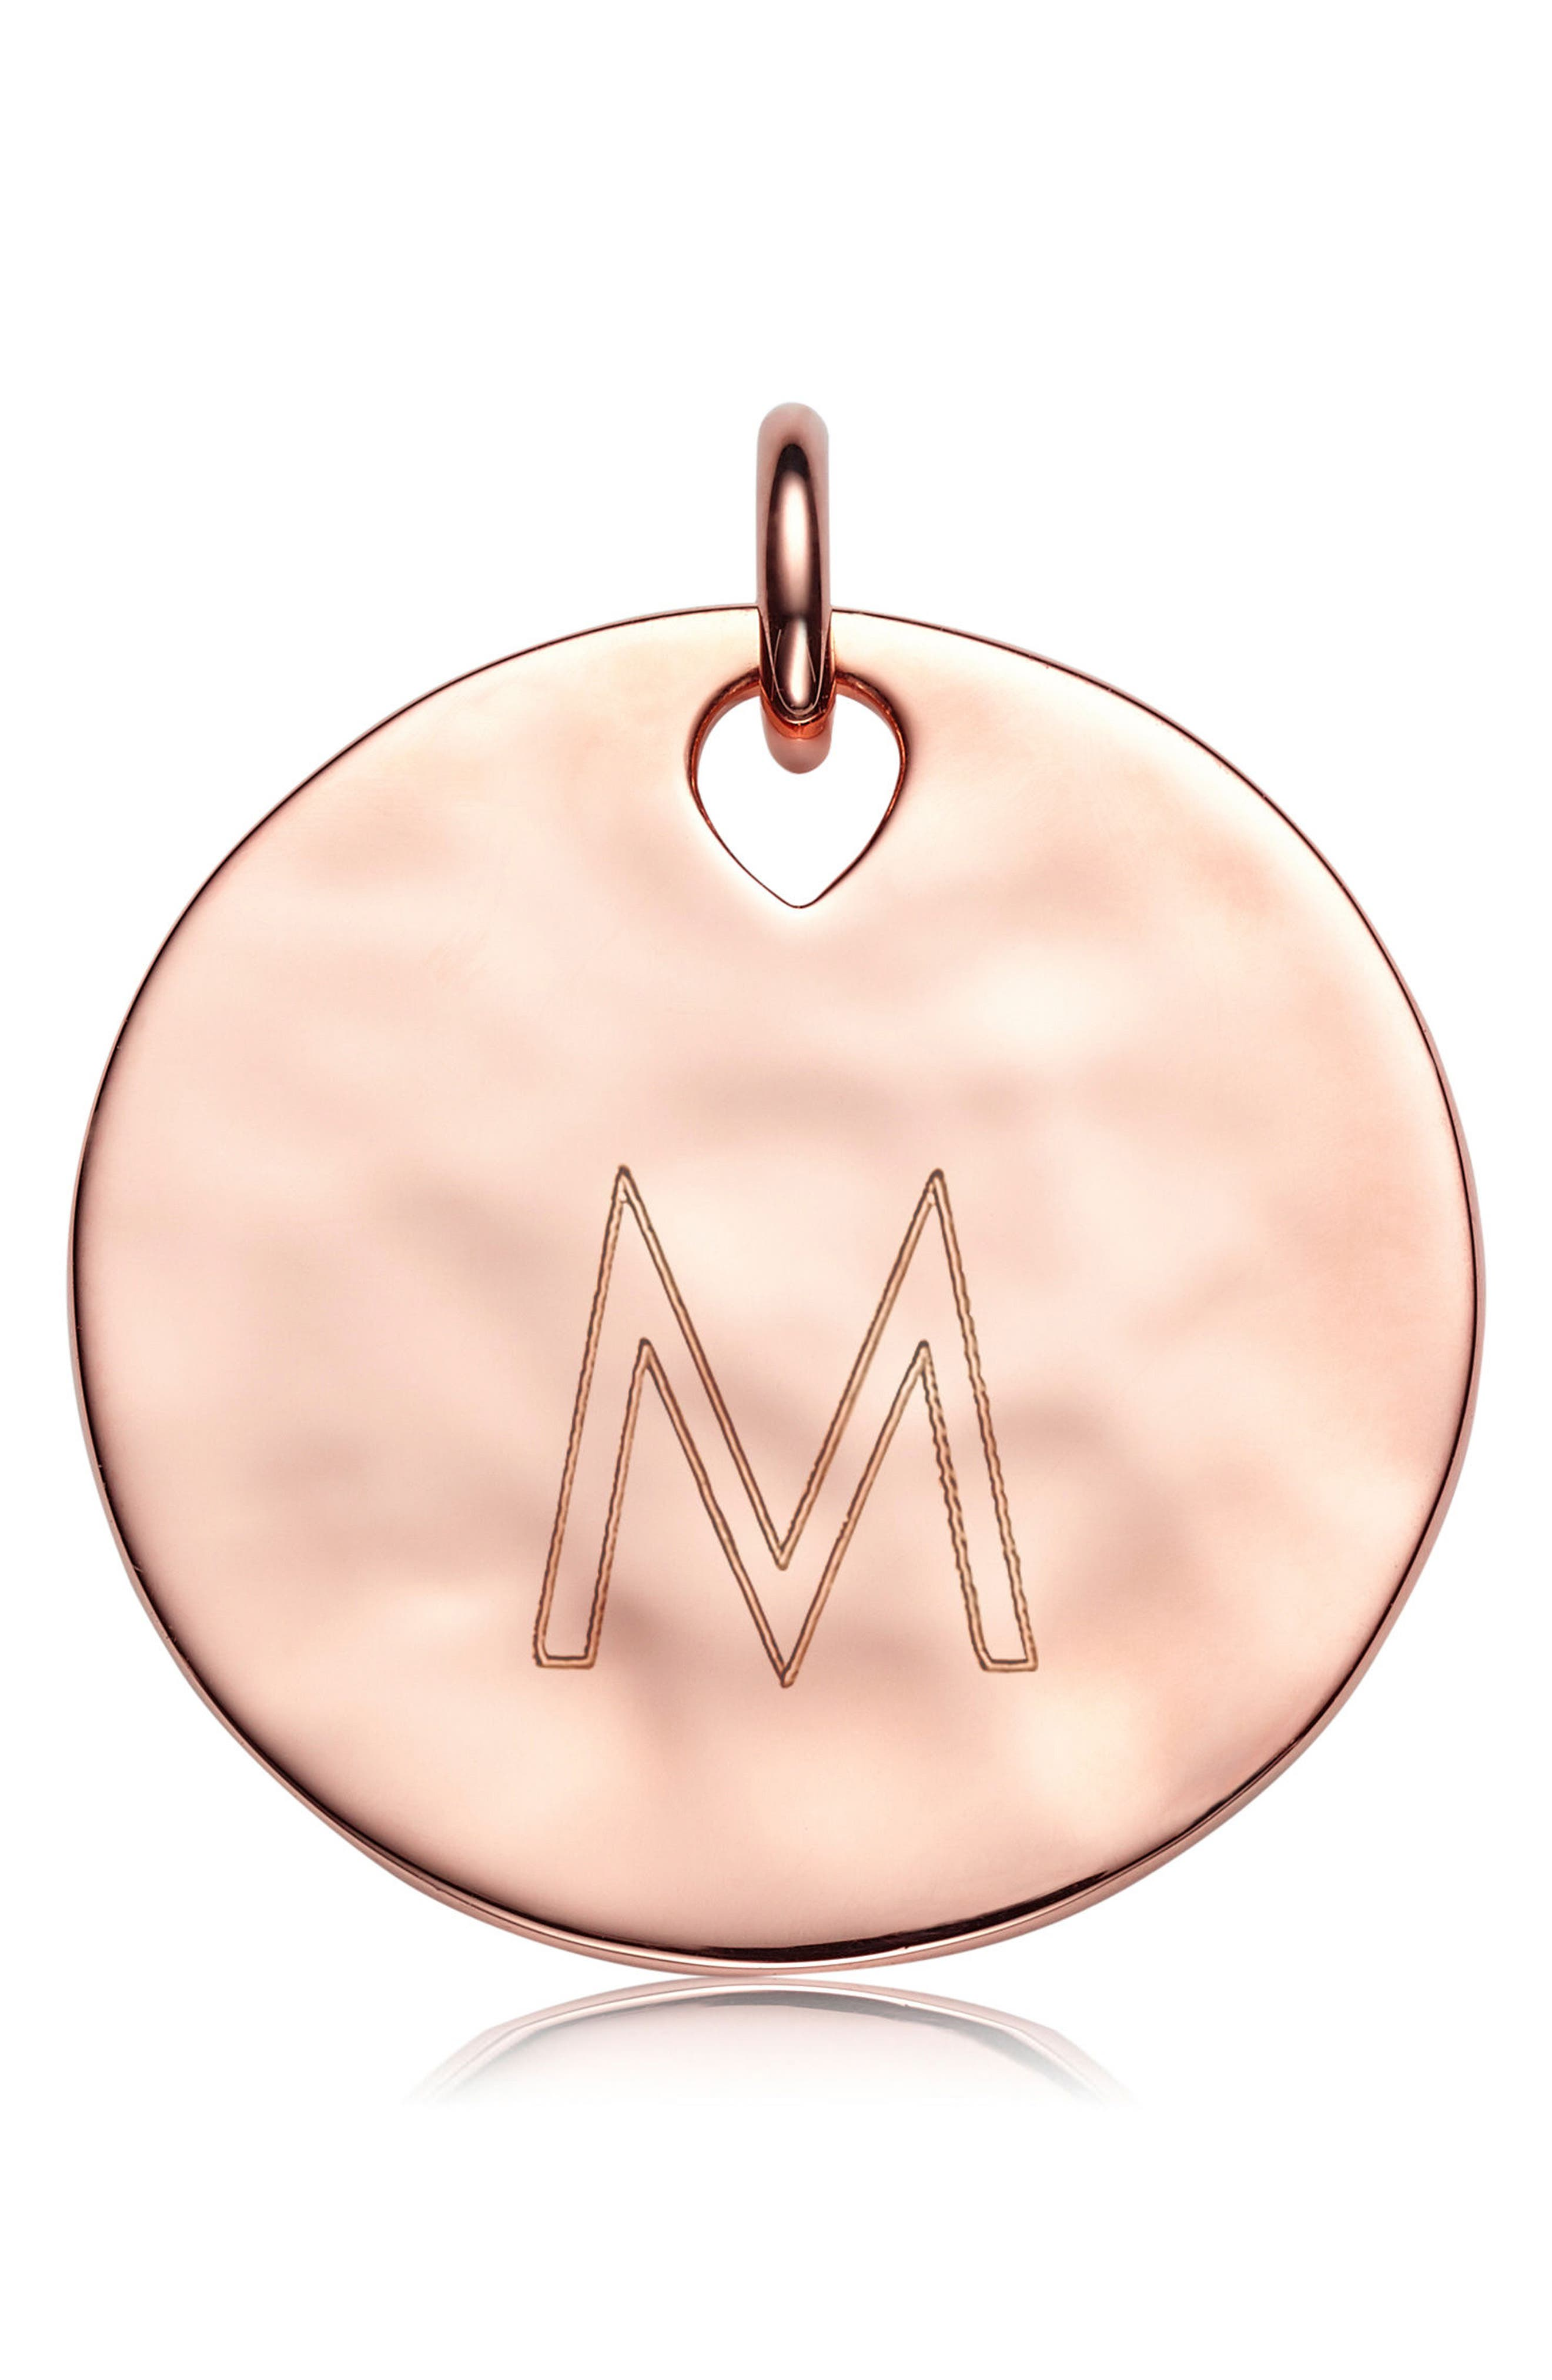 Engravable Havana Round Pendant Charm,                             Alternate thumbnail 4, color,                             ROSE GOLD